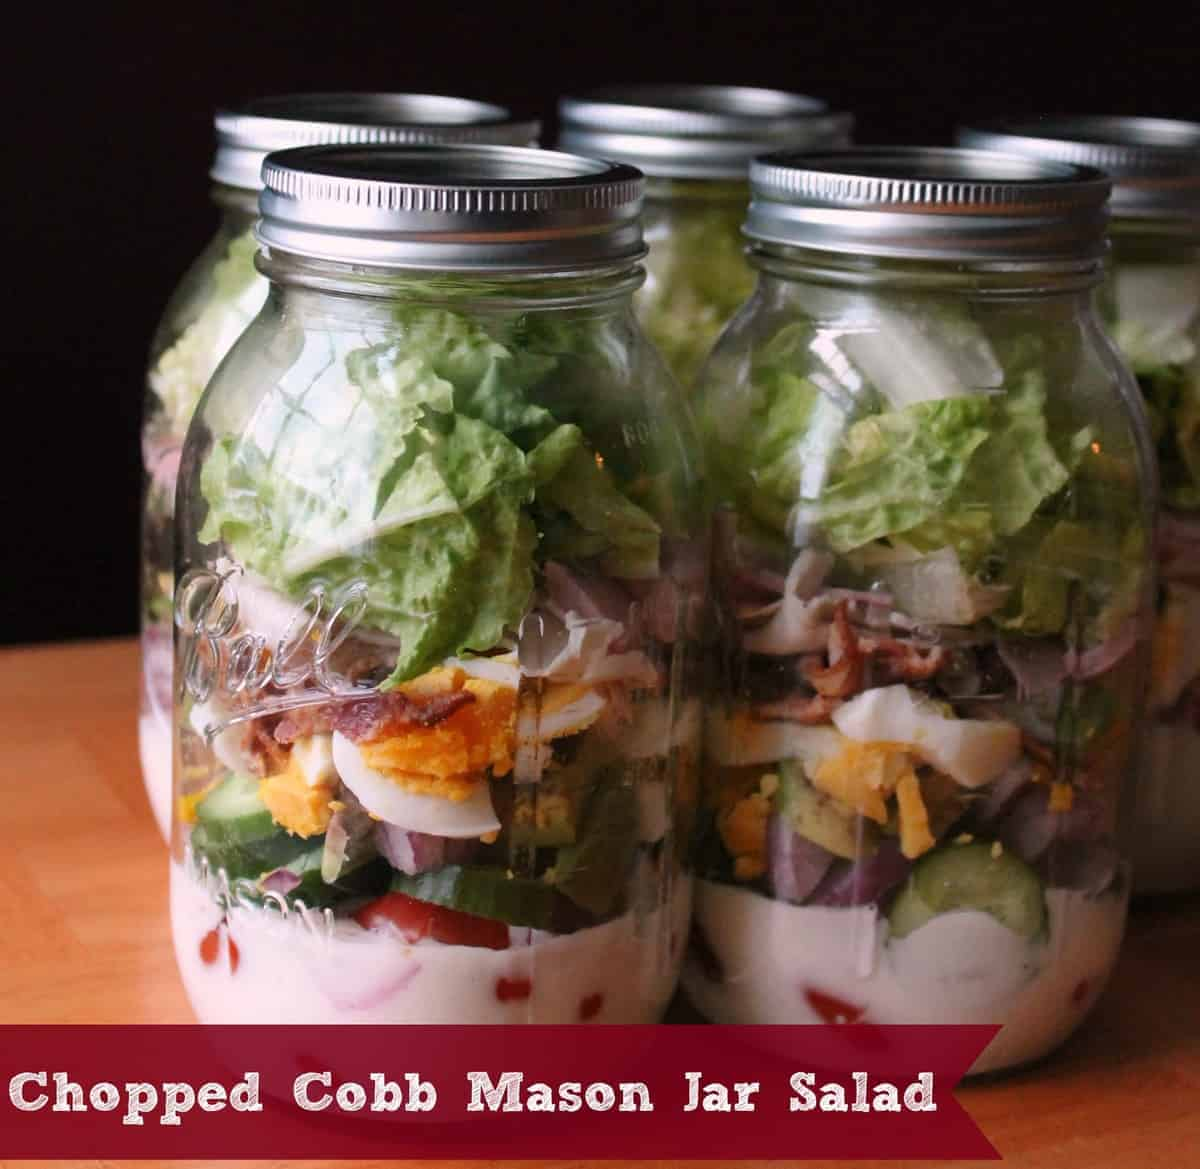 Chopped Cobb Mason Jar Salad - Organize Yourself Skinny